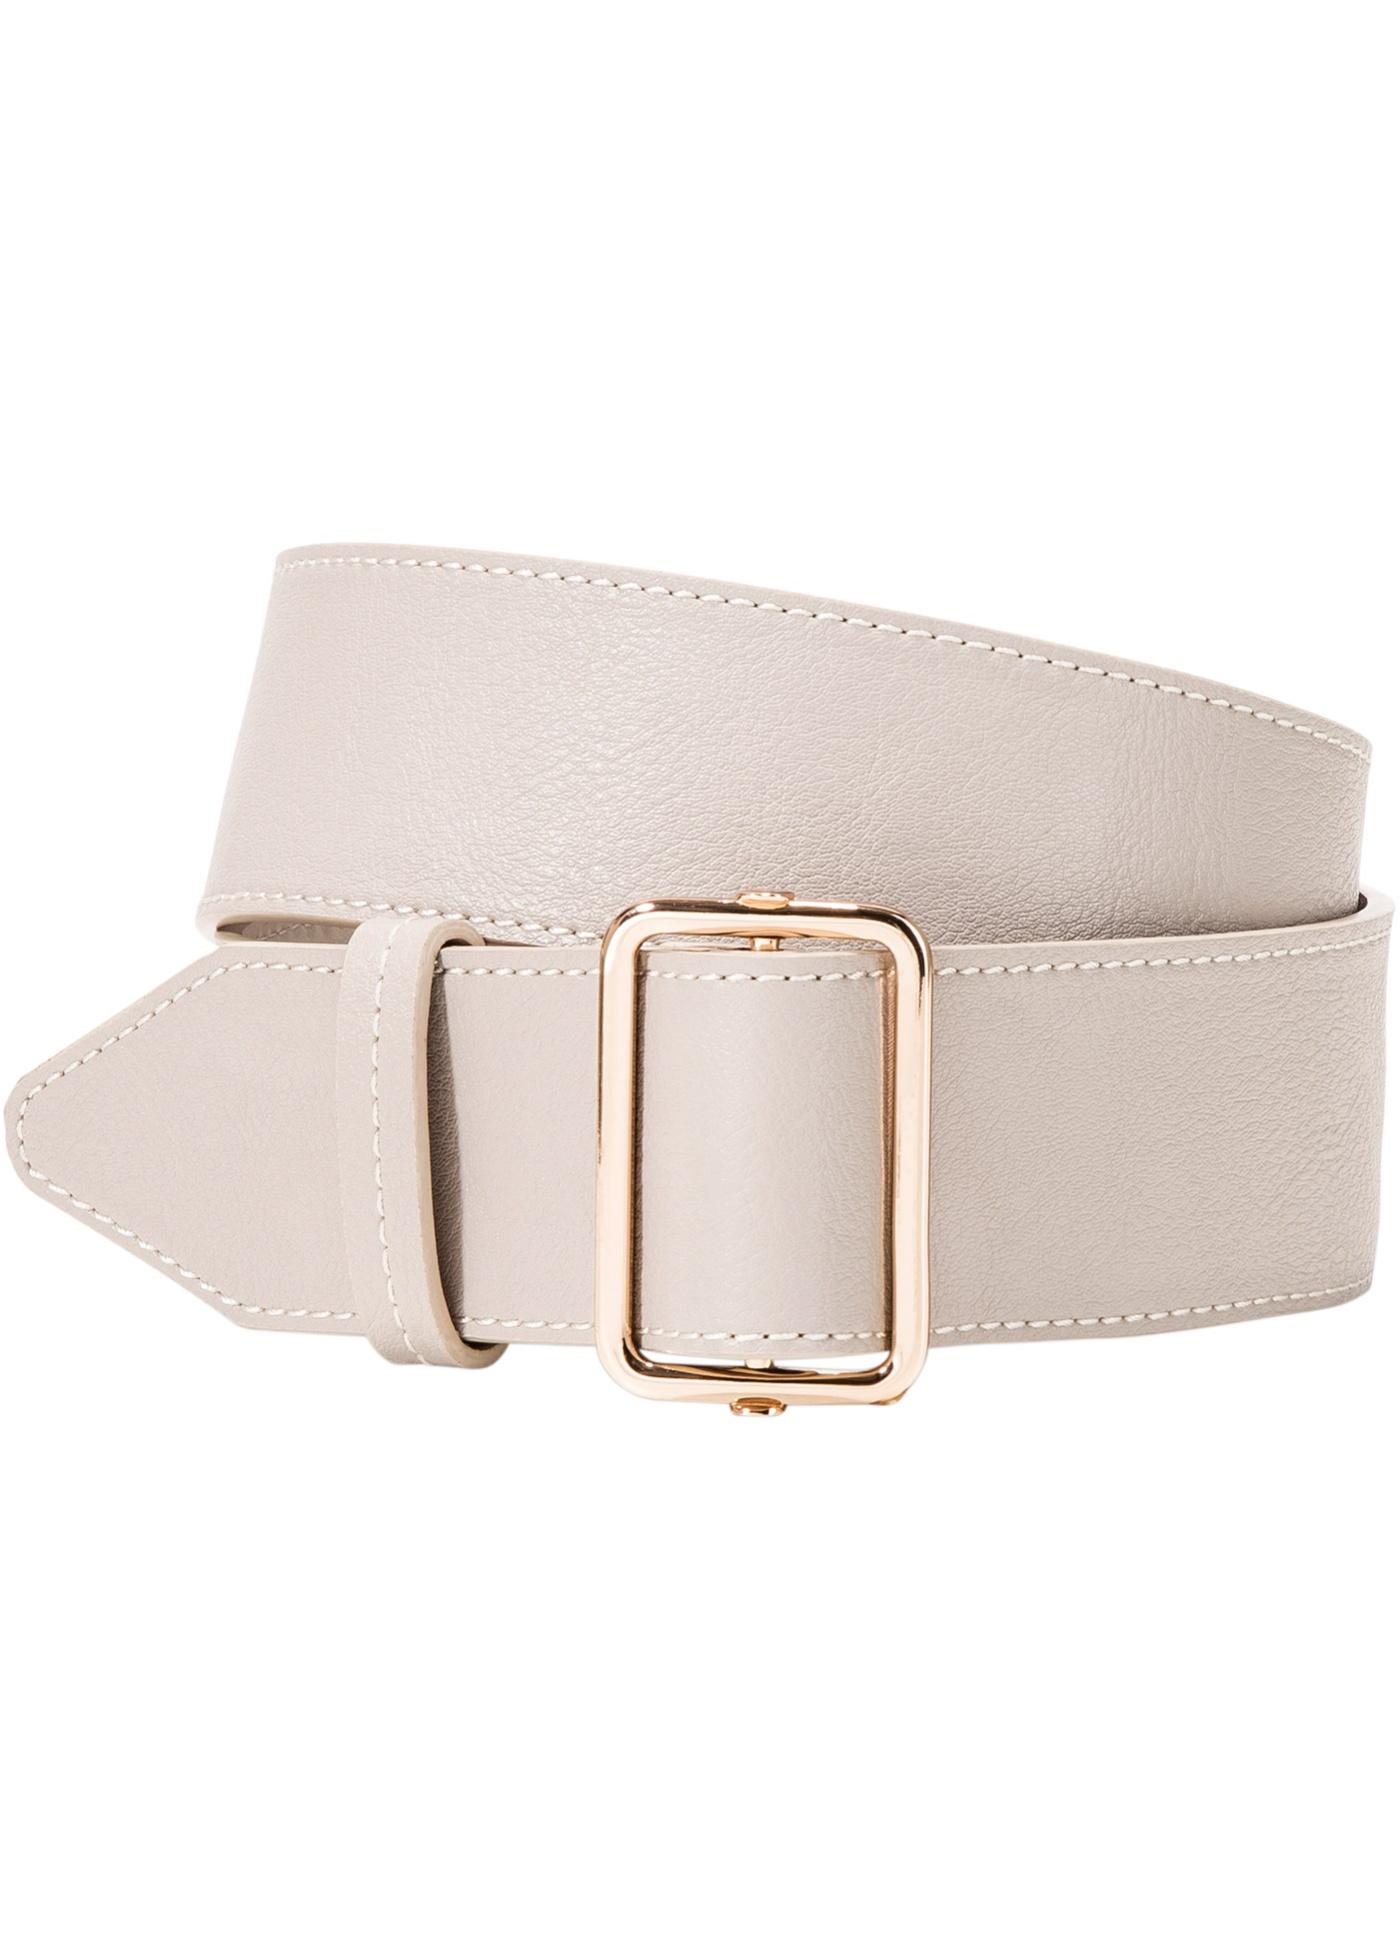 Cintura larga in similpel